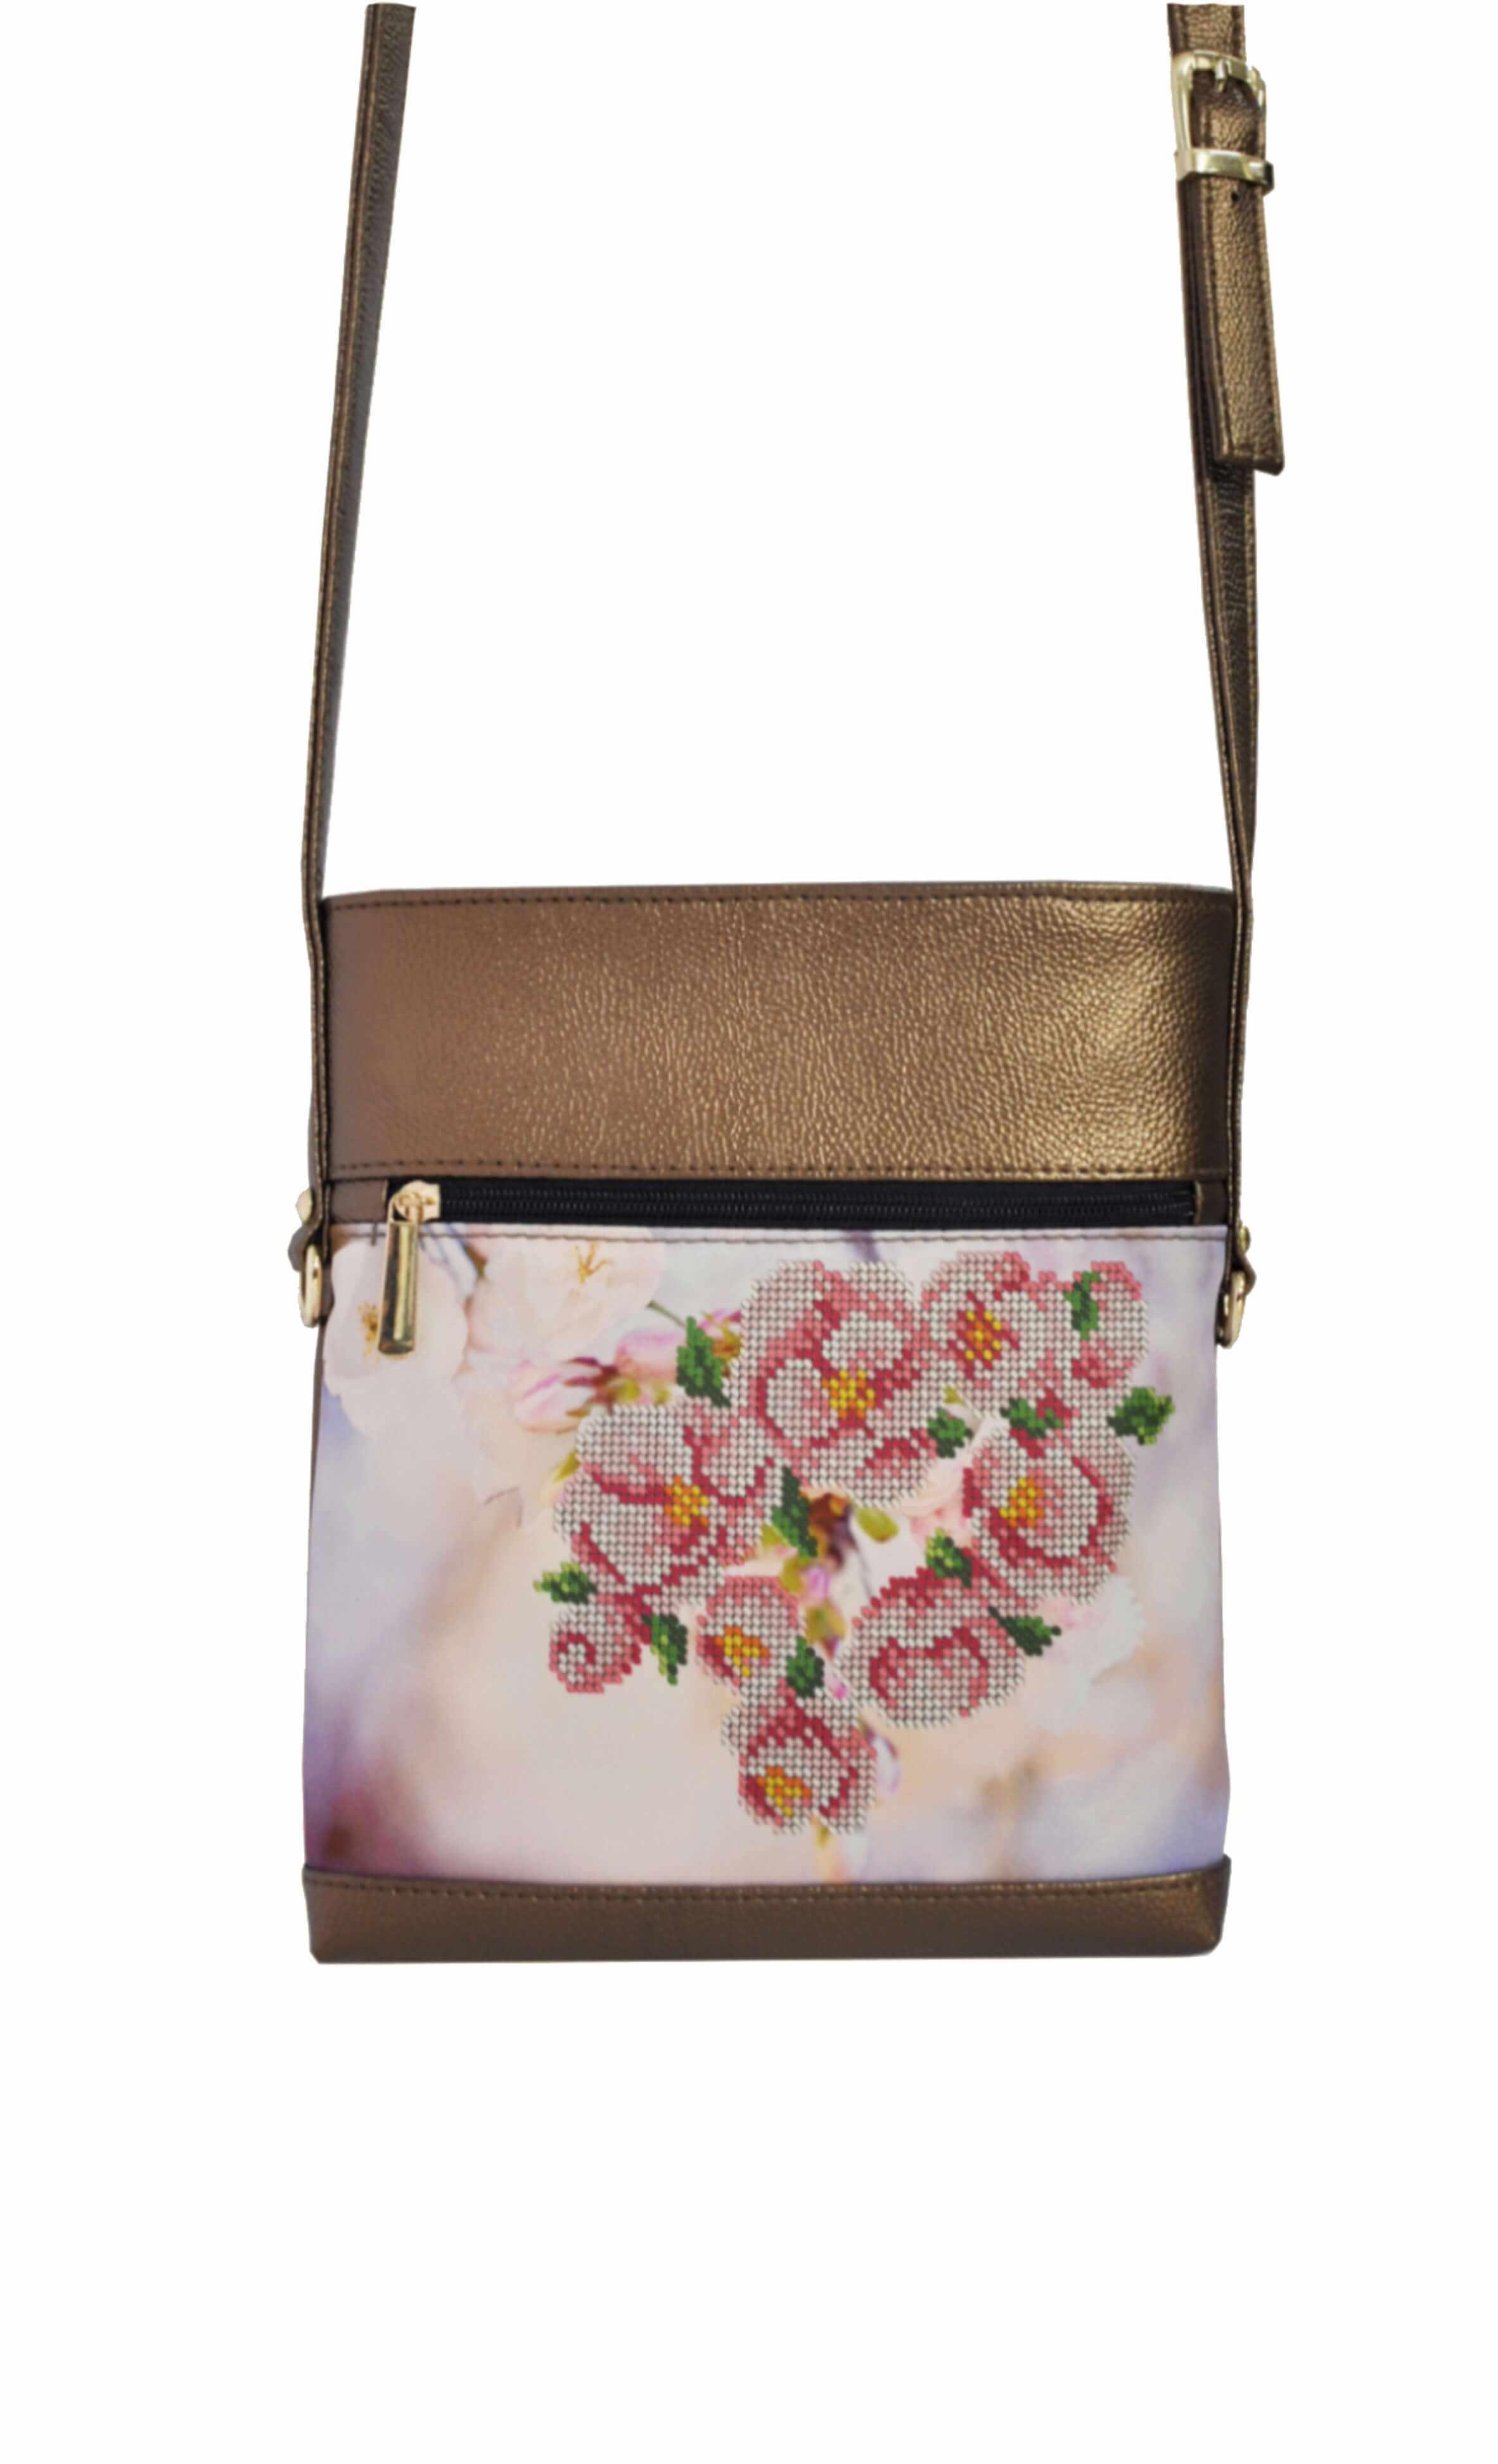 САБ-8003 Набор для вышивания на сумке. Темно-коричневое золото. Весна